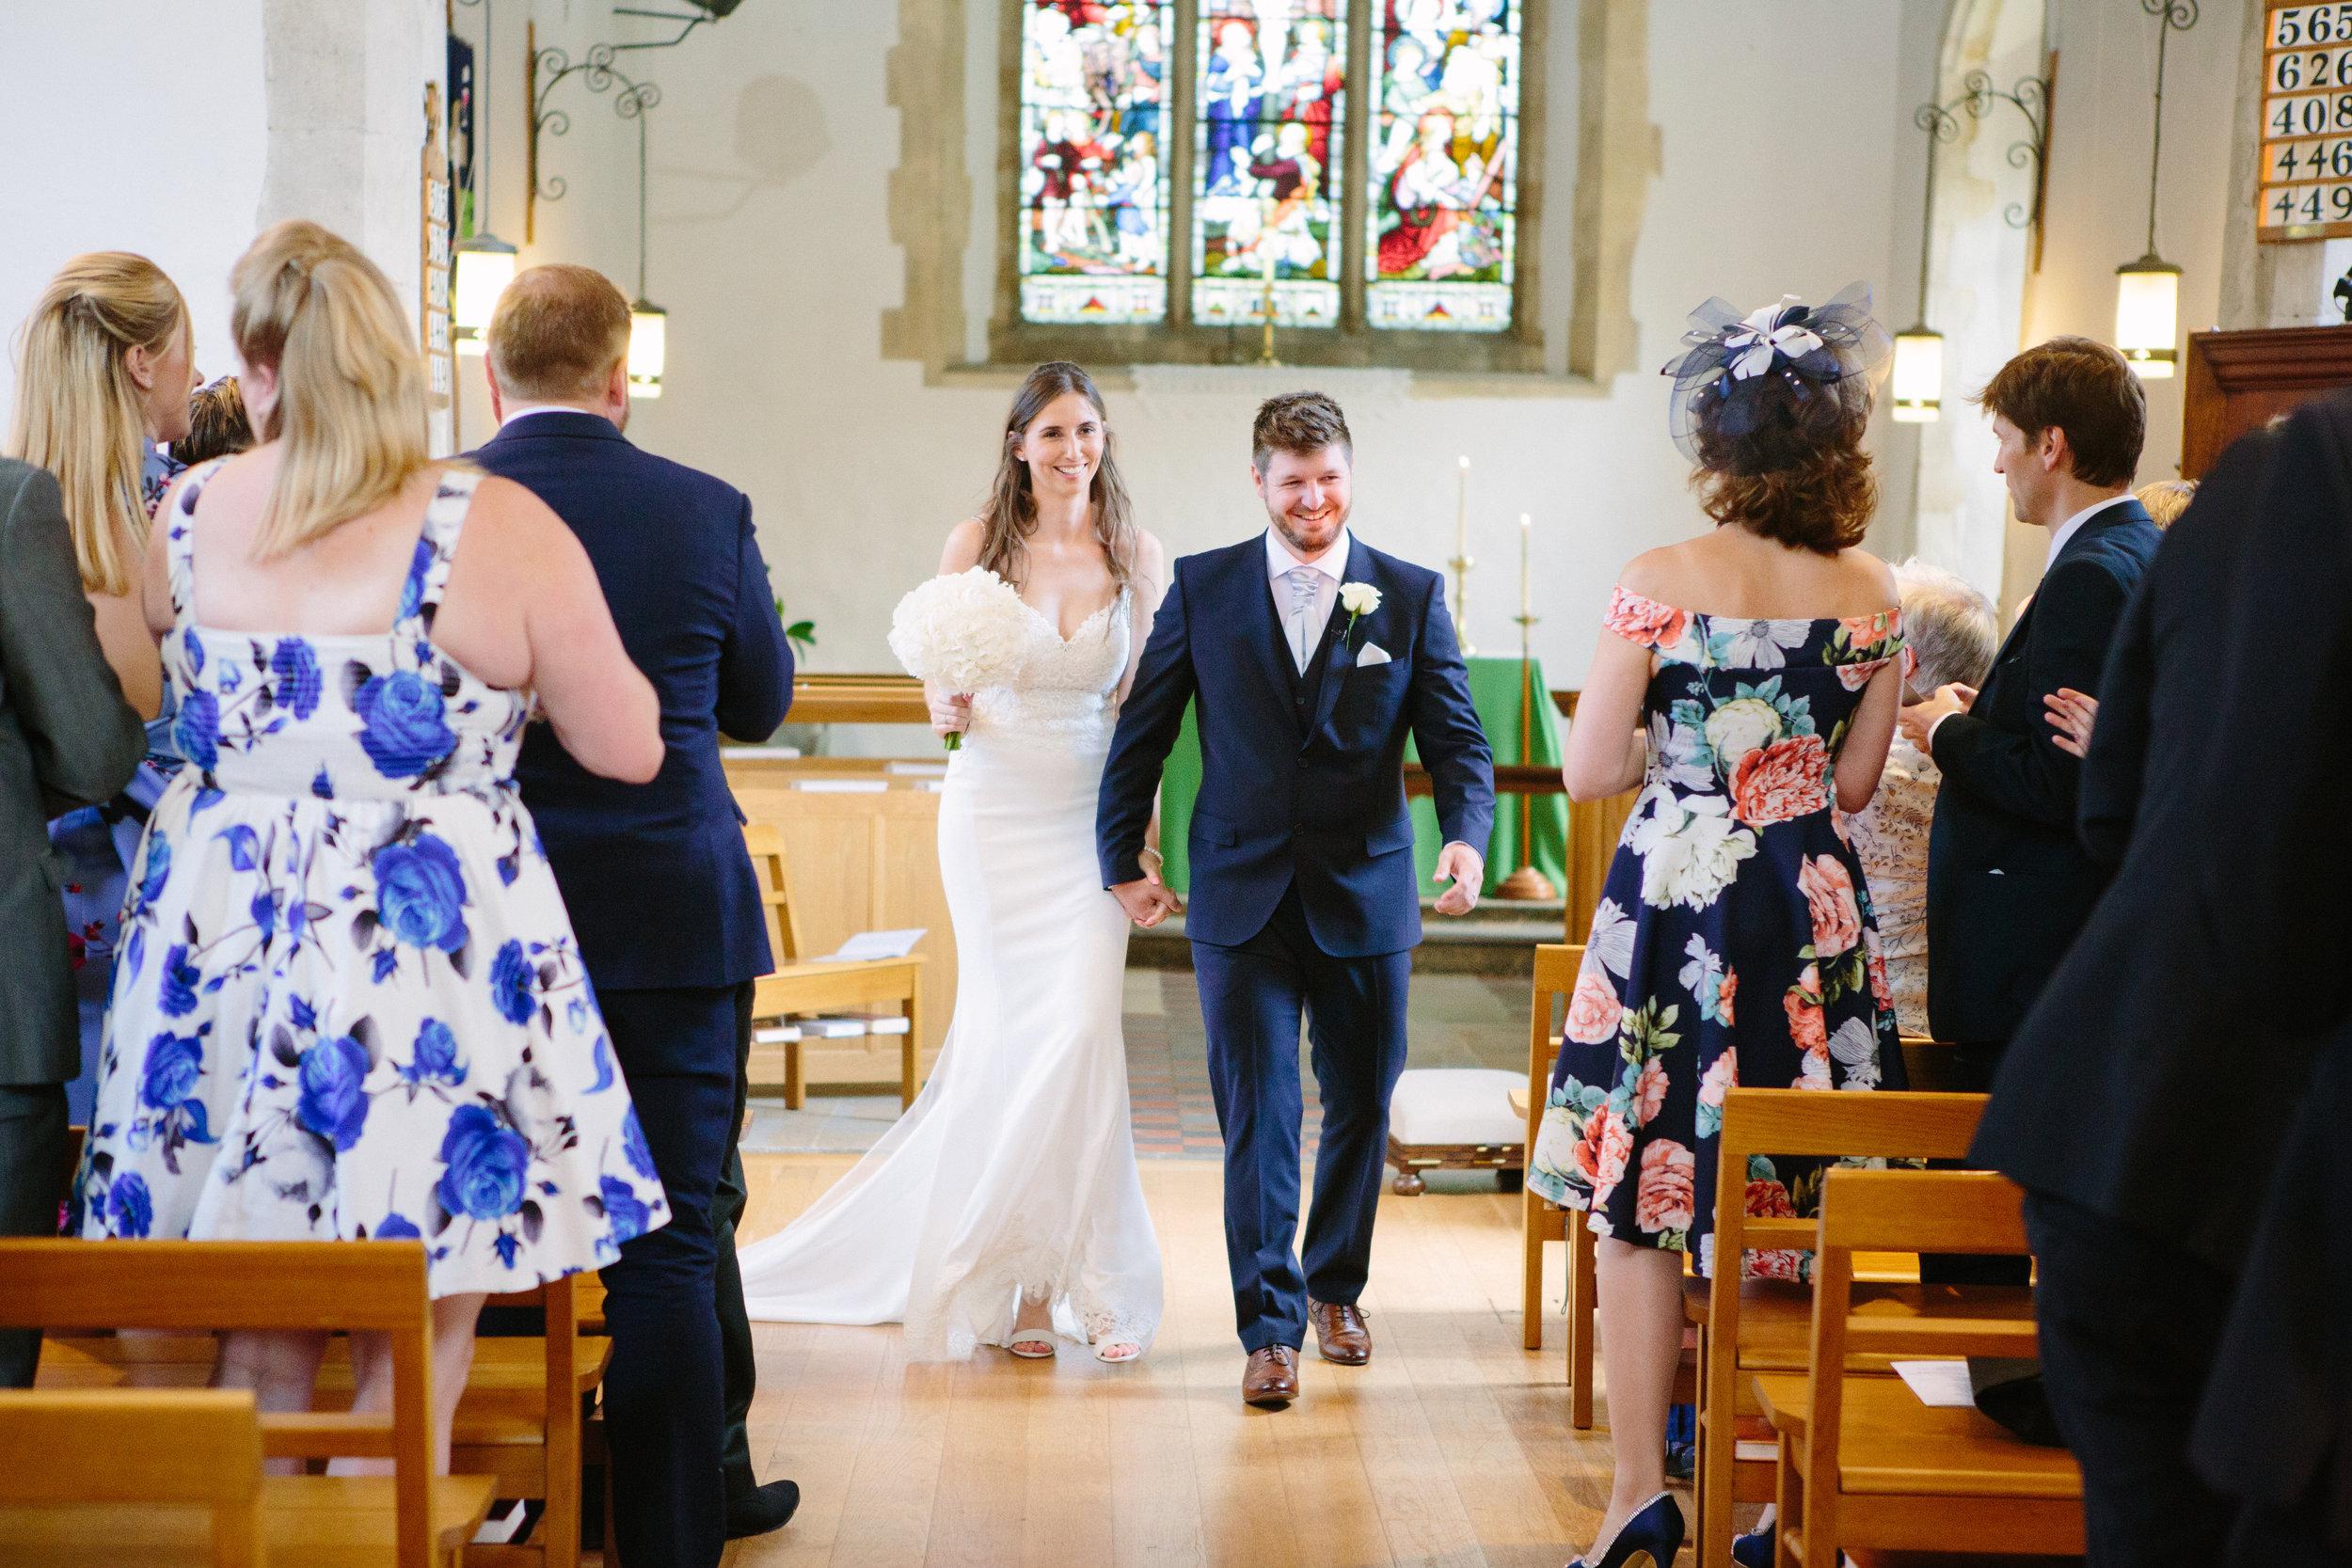 kent-wedding-photography-kingsnorth-church-bride-groom-aisle-01